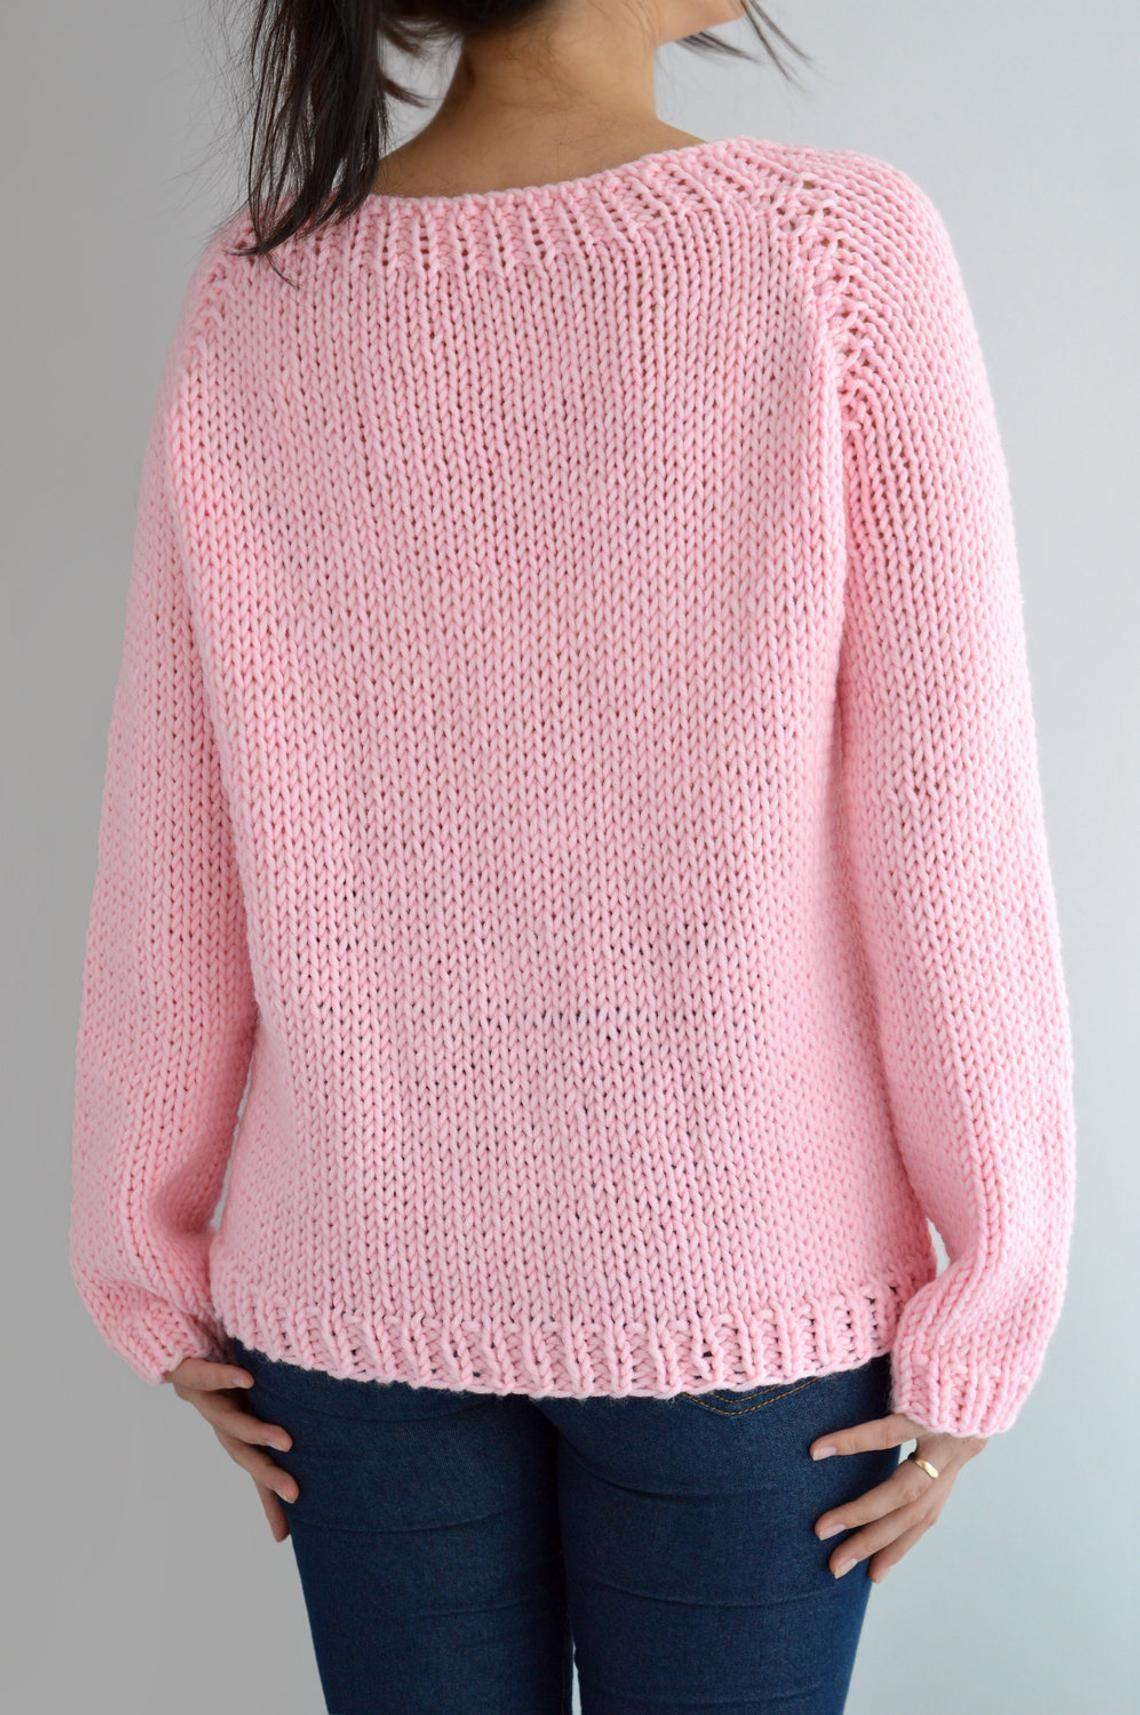 Fairy Kei Sweater Pattern // Oversized Sweater Menhera ...